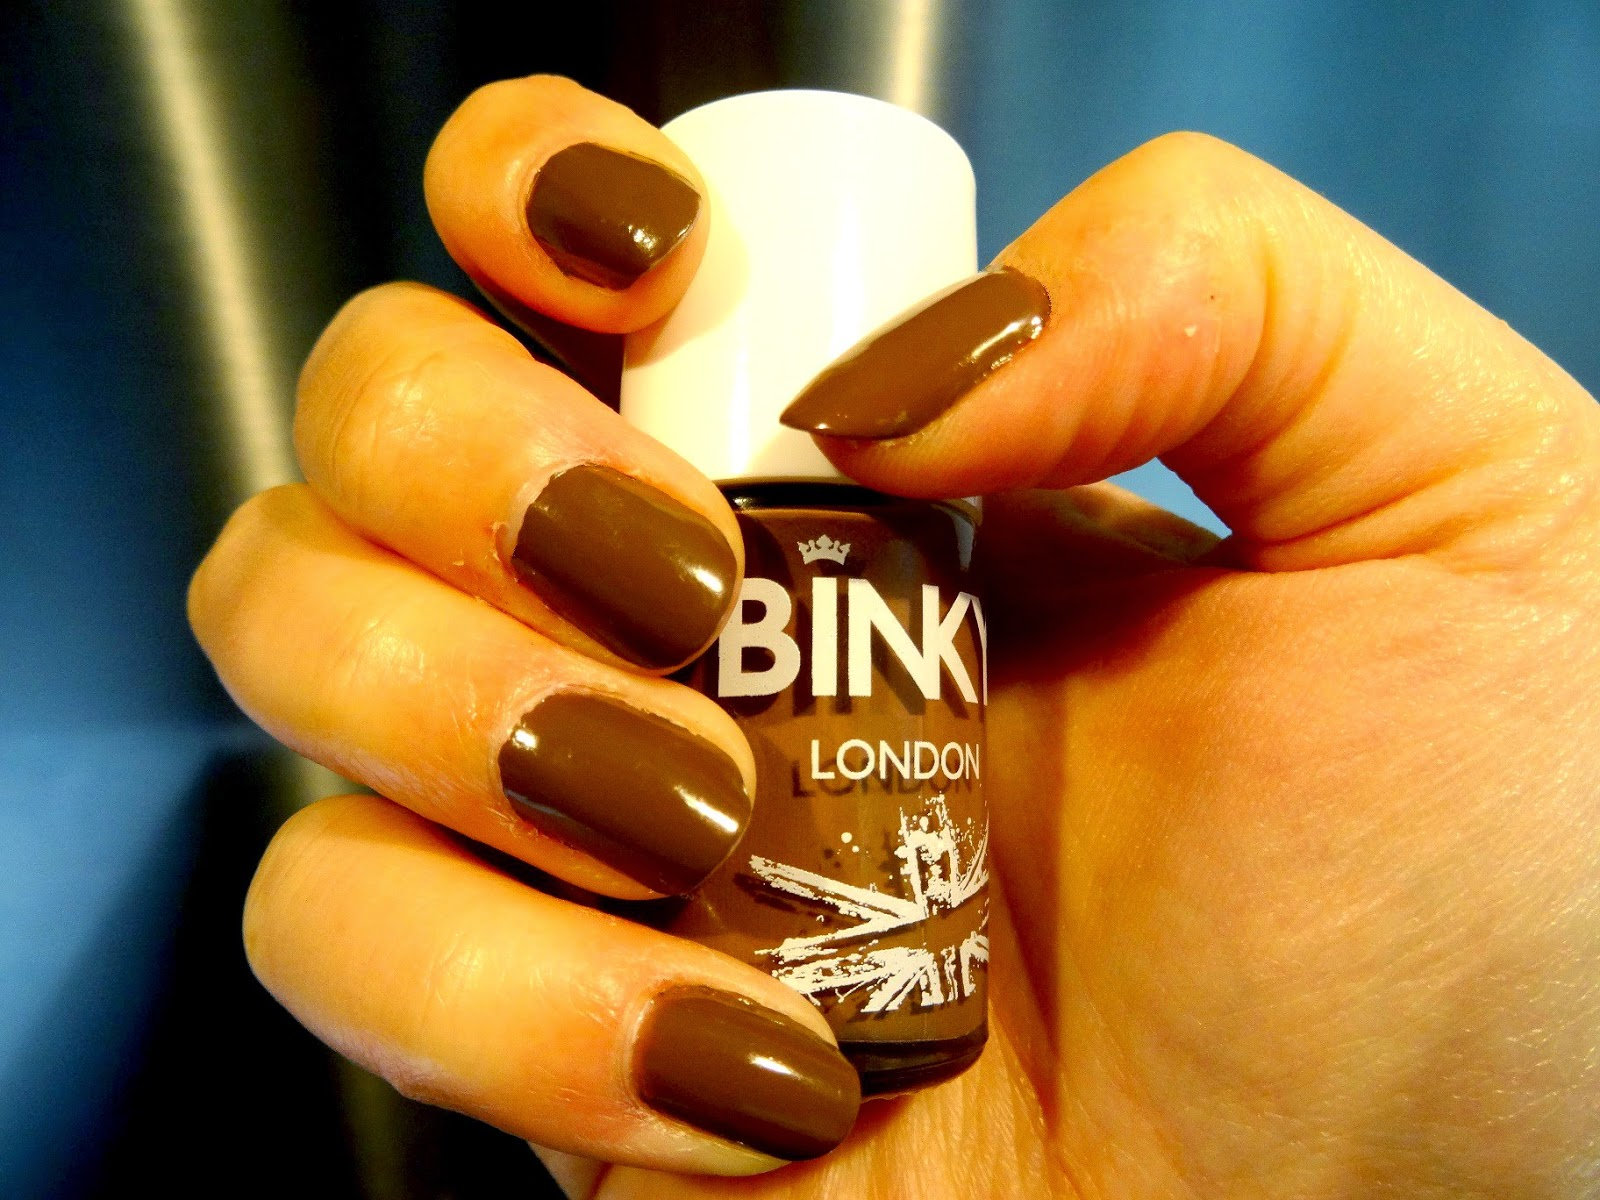 Mocha Geld Binky autumn nail varnish